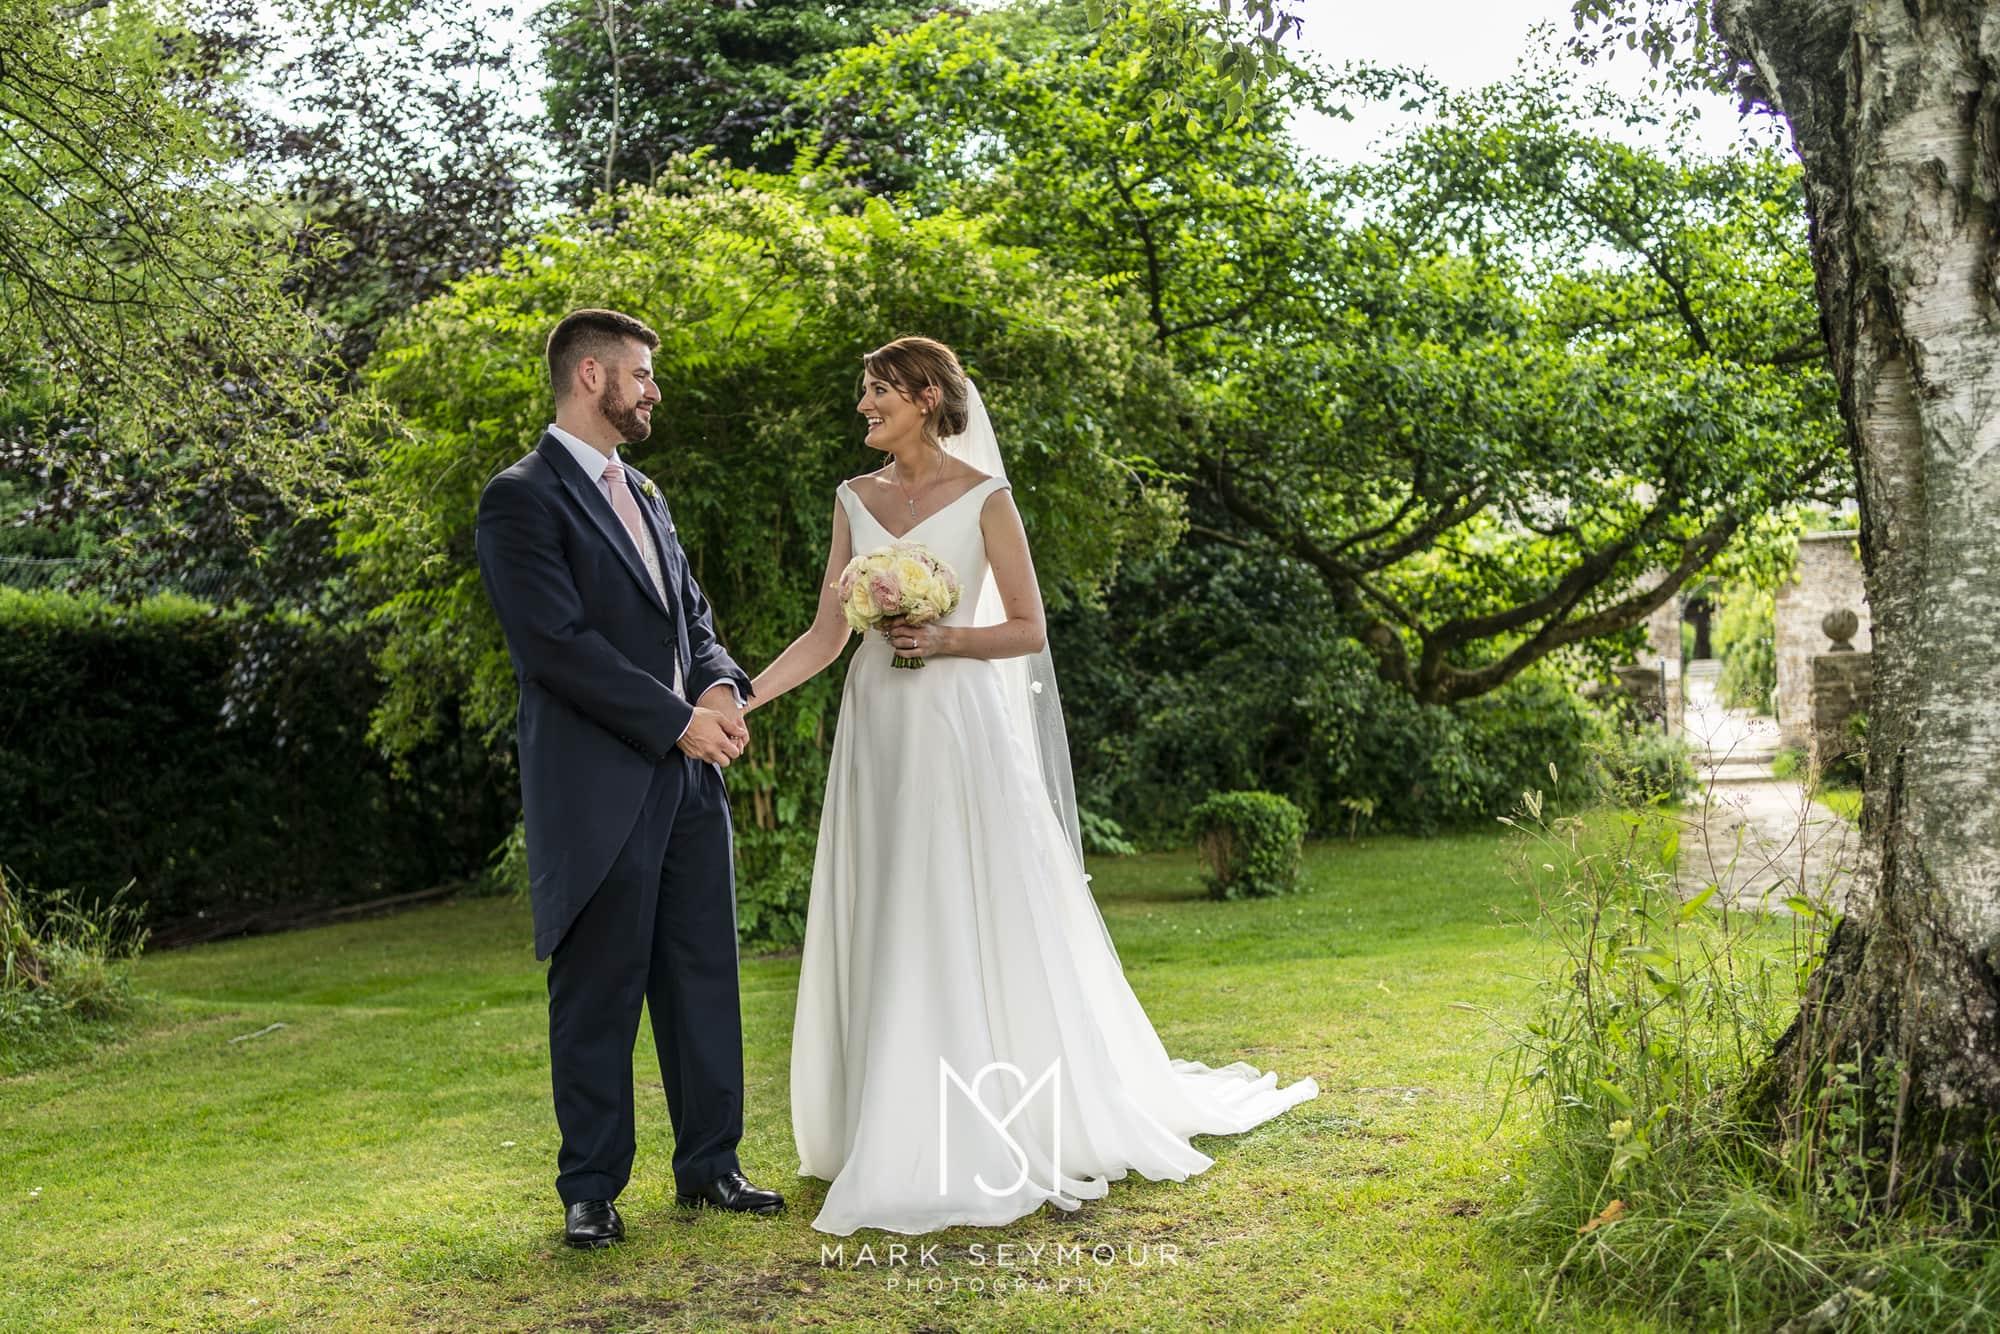 Barnsley House Wedding Photographer - Olivia and James' wedding 24